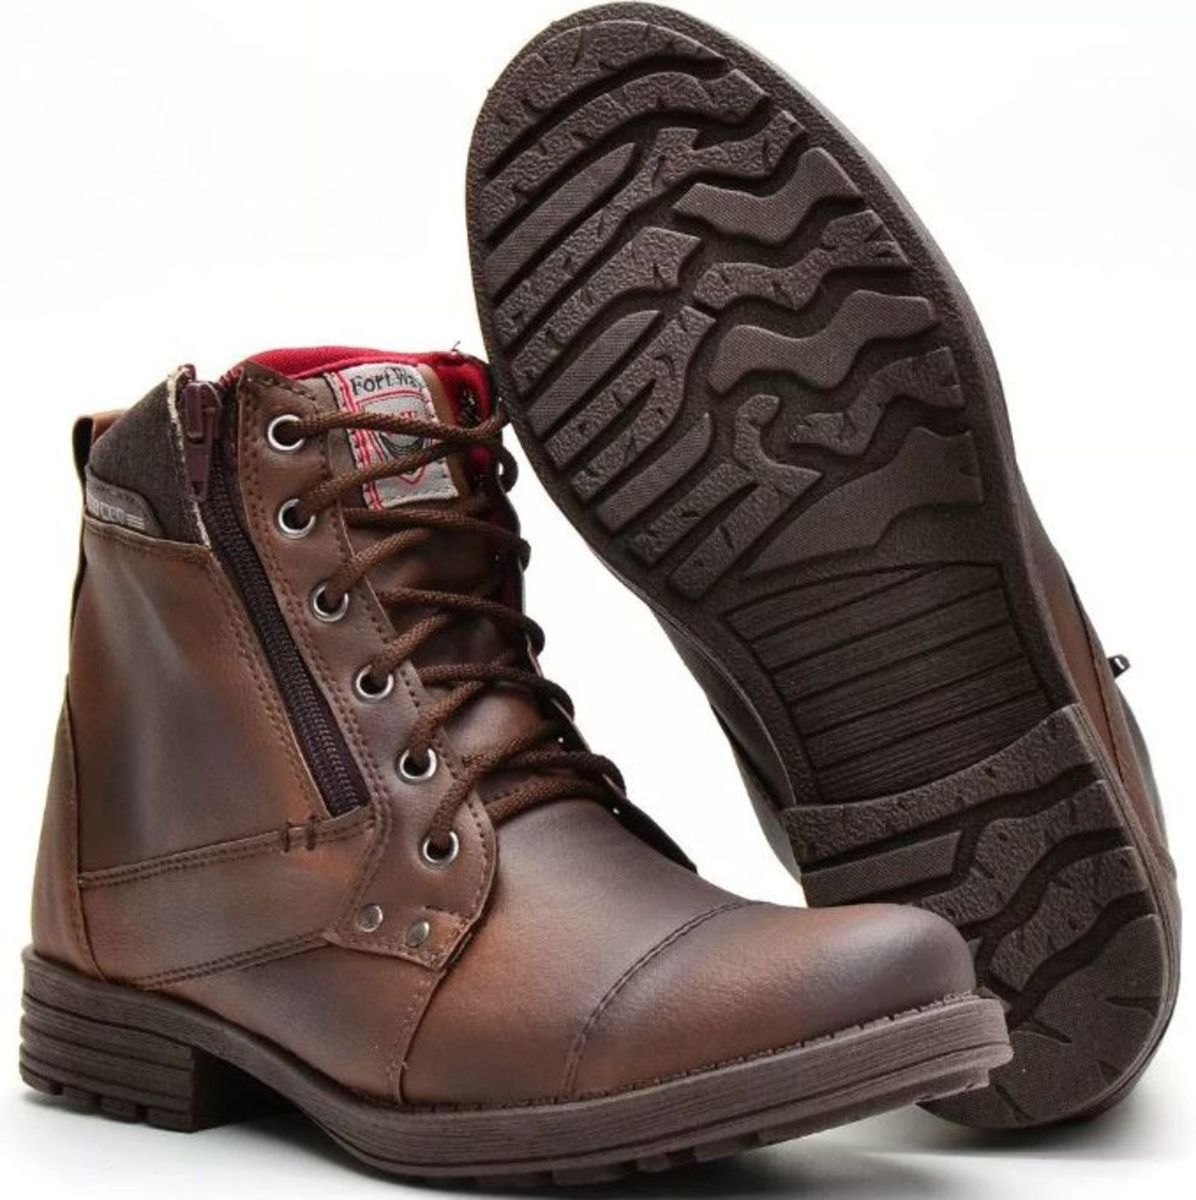 8de8021ff0 bota masculina sapato coturno casual super leve ziper - botas fort way